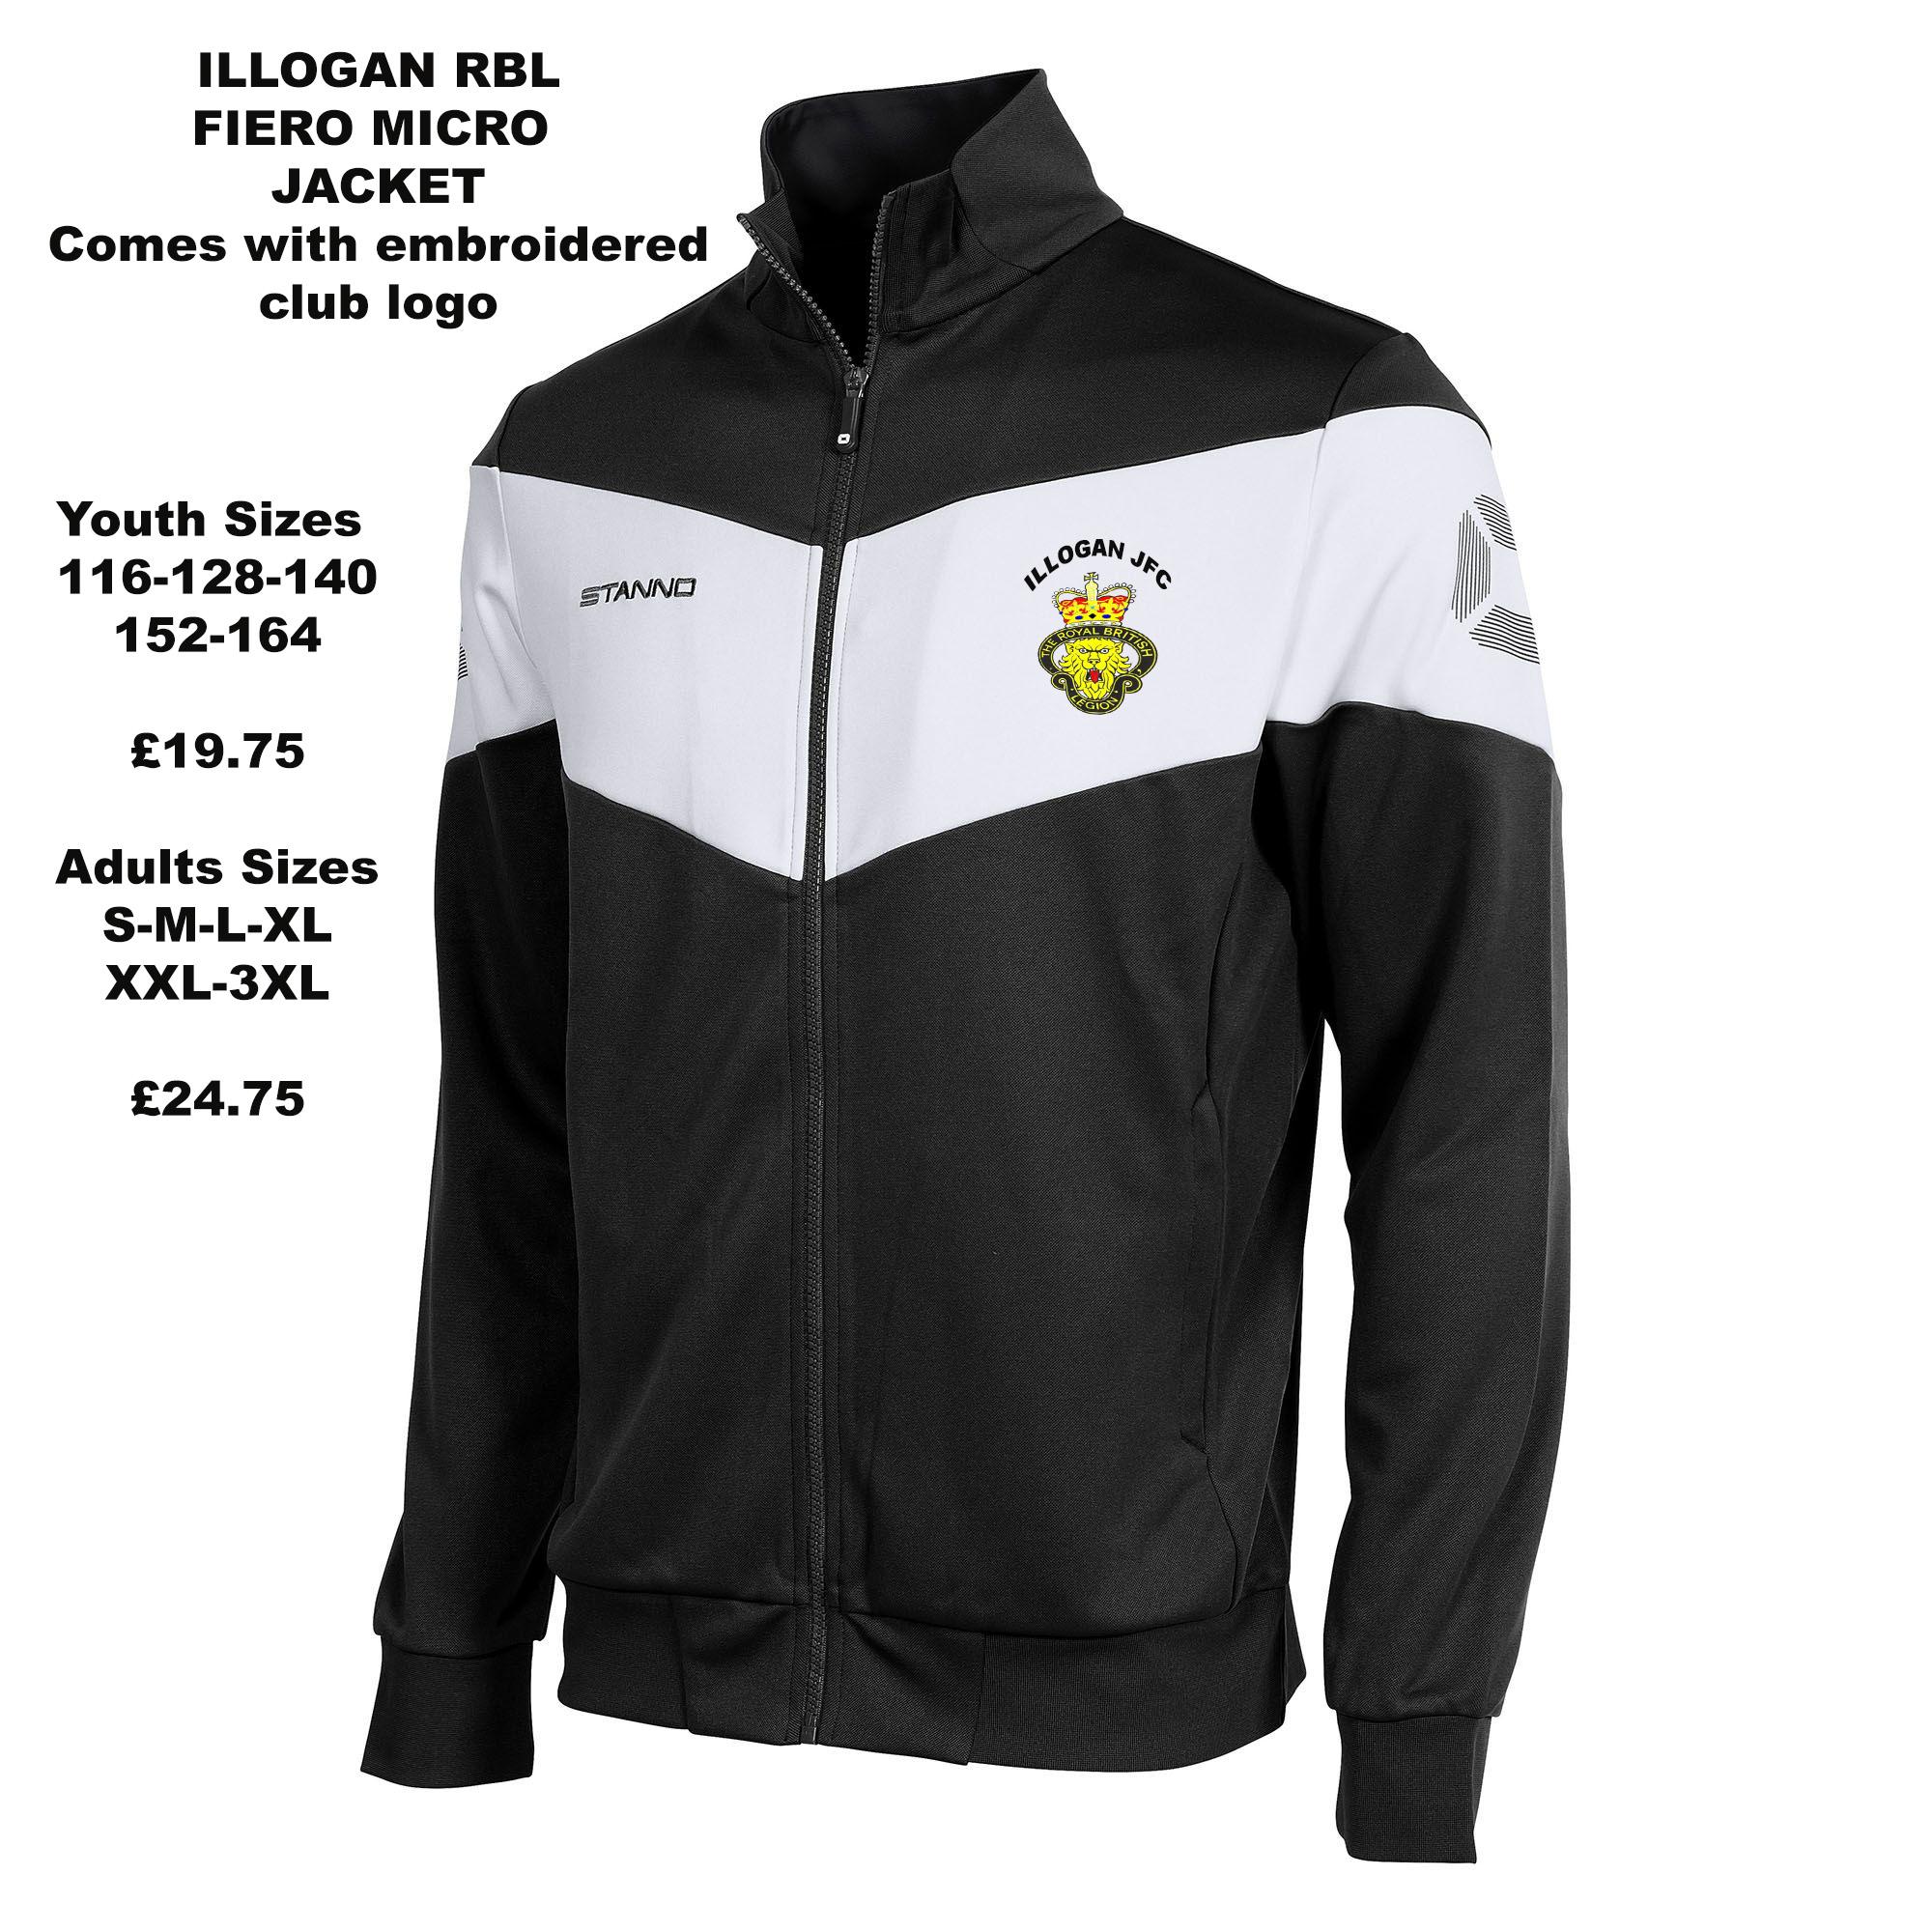 Fiero Micro Jacket